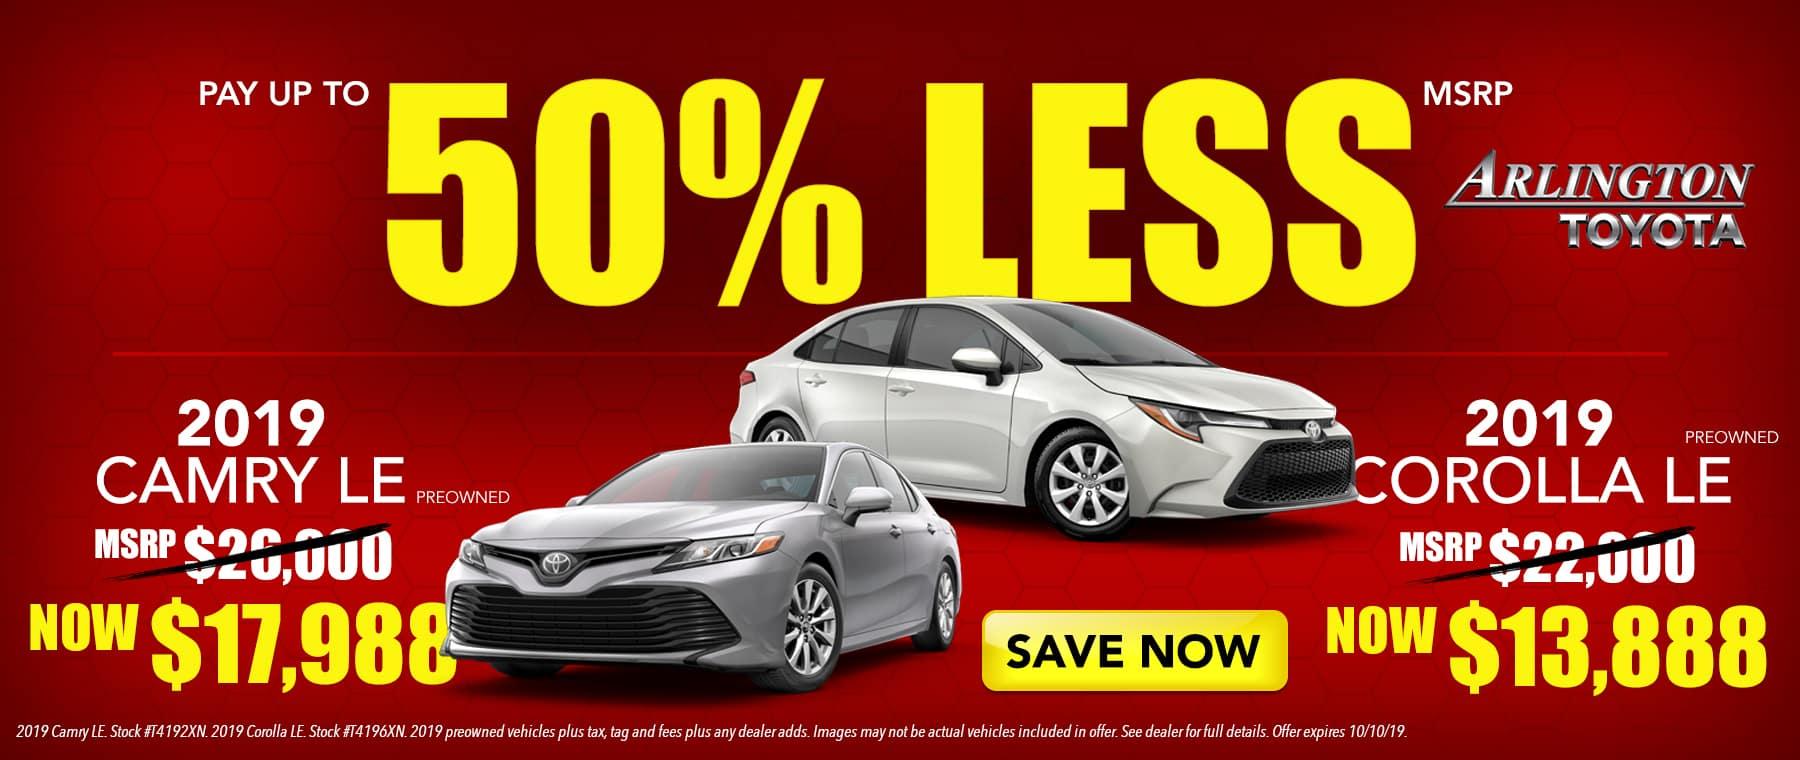 Toyota Car Dealership in Jacksonville, serving Atlantic